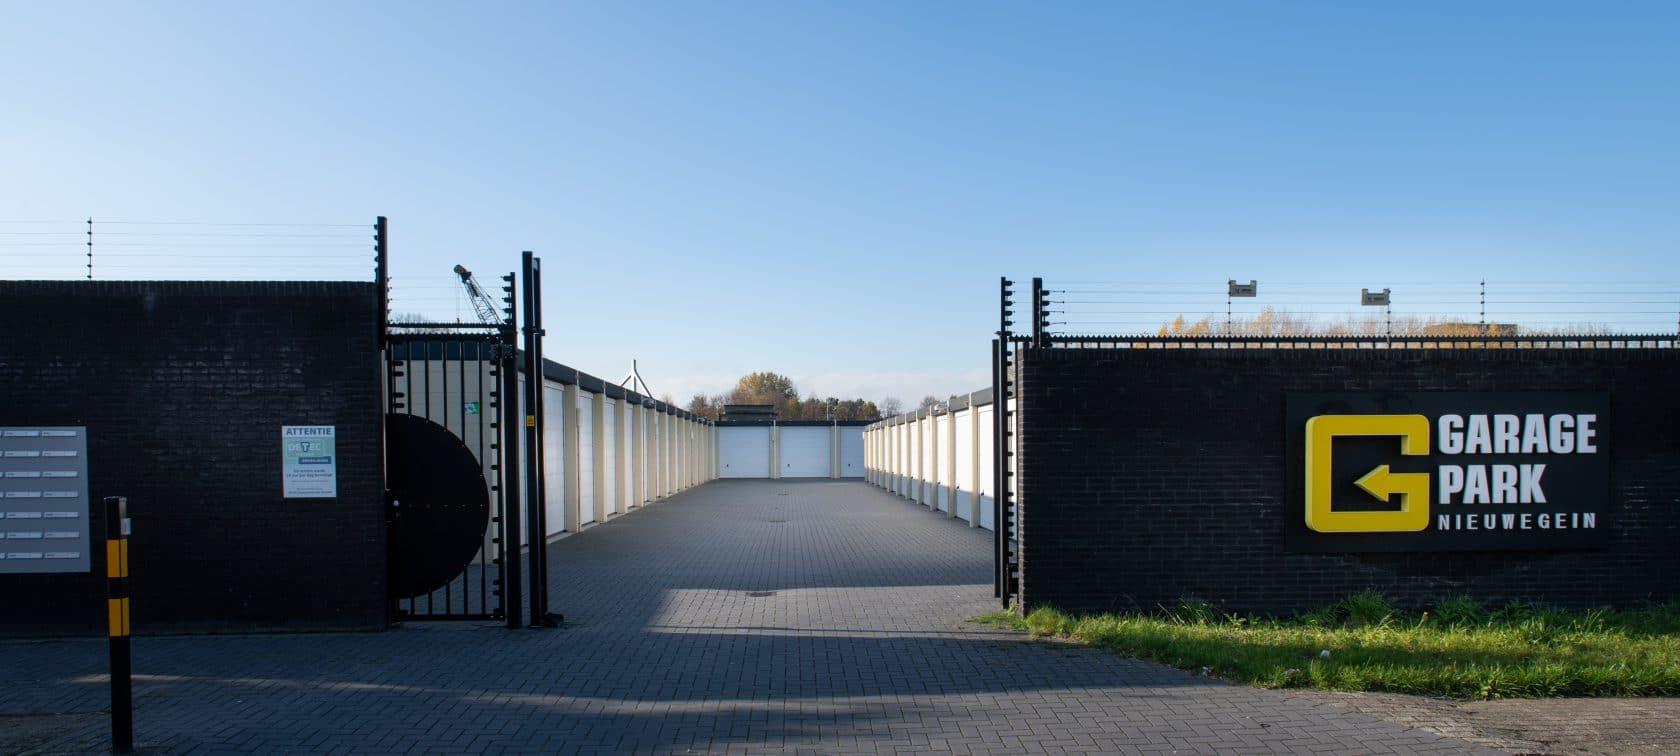 GaragePark Nieuwegein - Garageboxen Nieuwegein